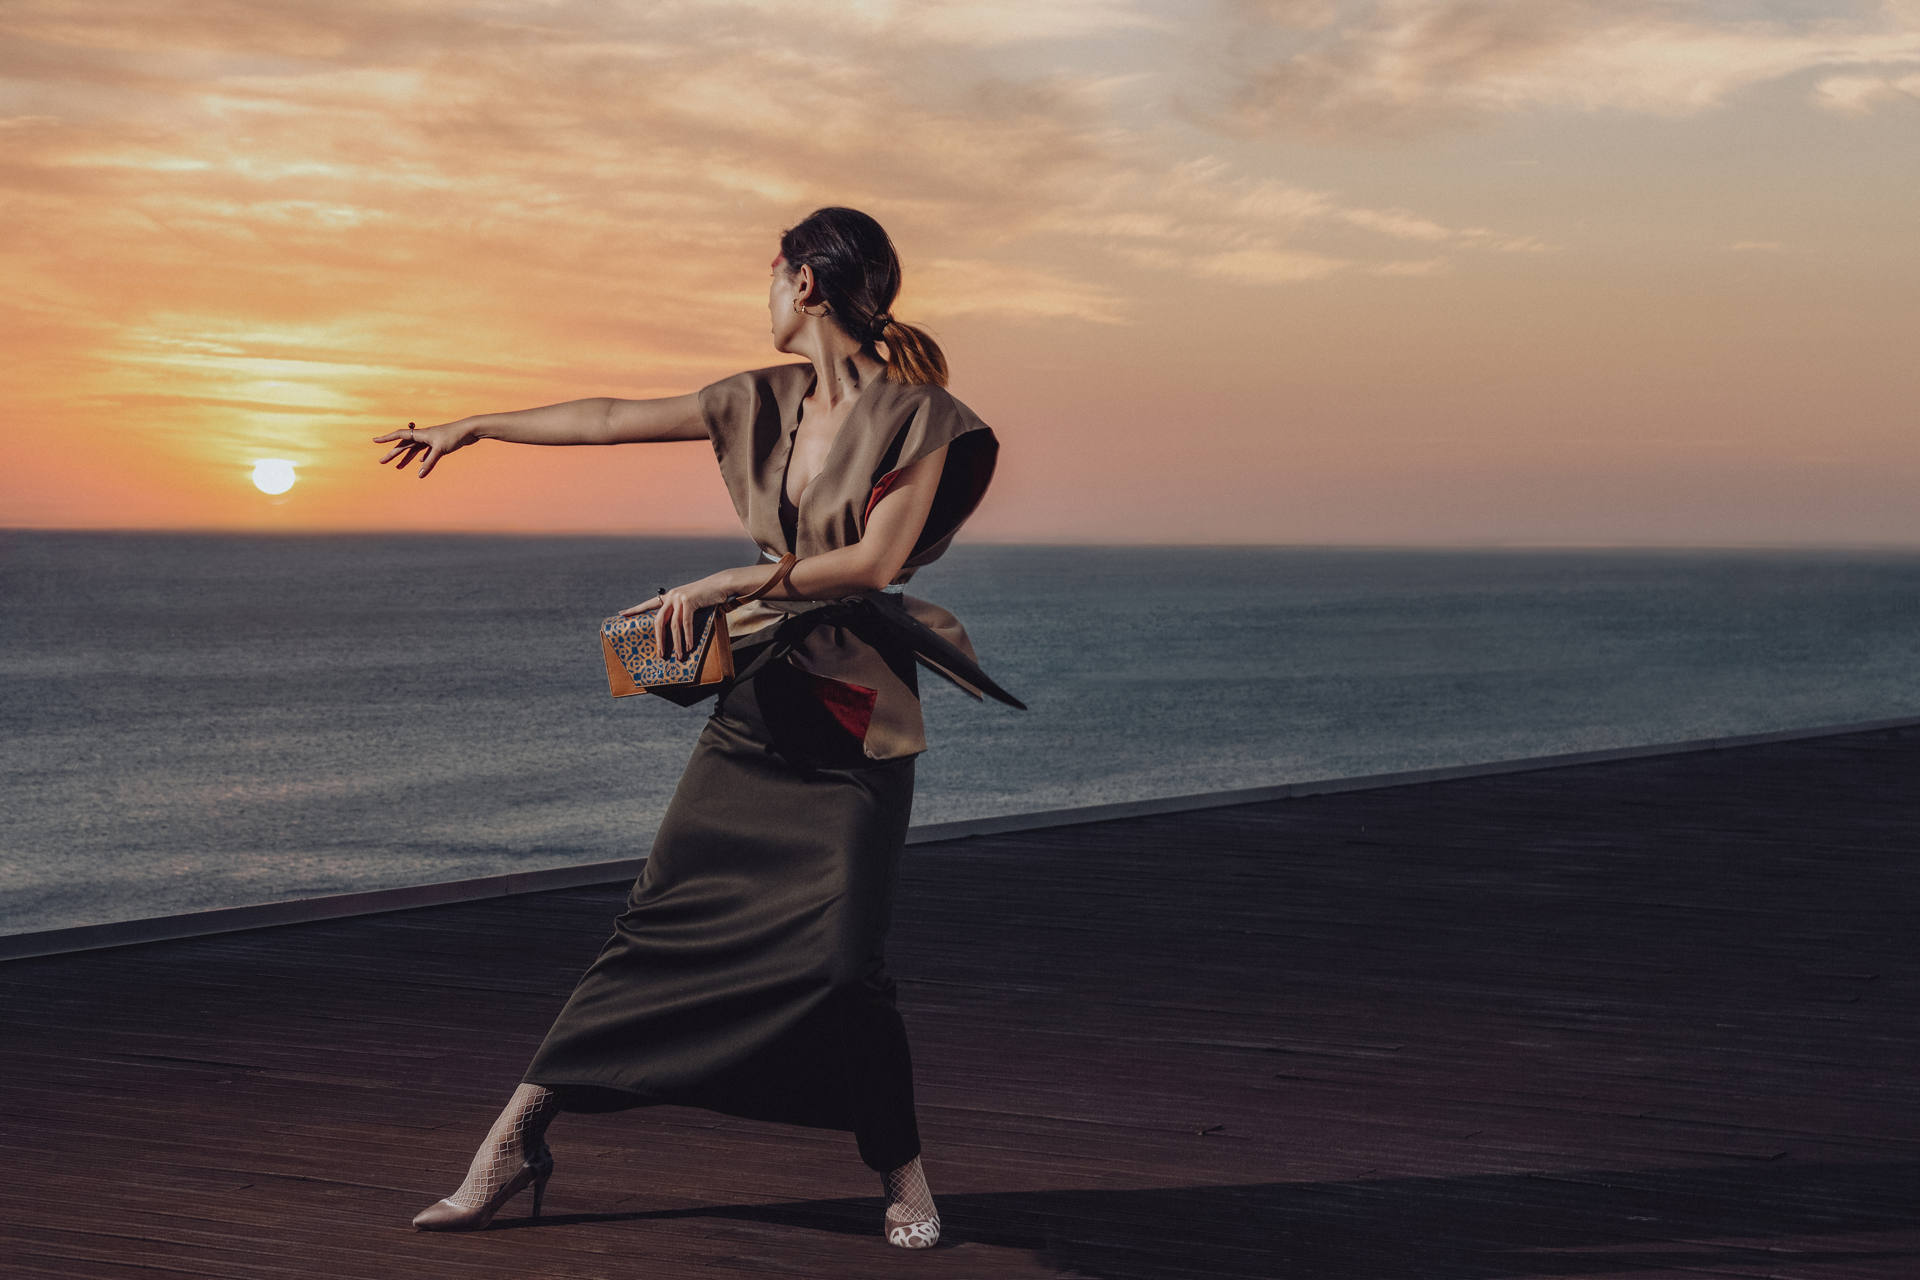 Ma Collection, Avasan, Tribute to Kansai Yamamoto, Avasan Fashion, luxury fashion, sustainable fashion, sustainable luxury